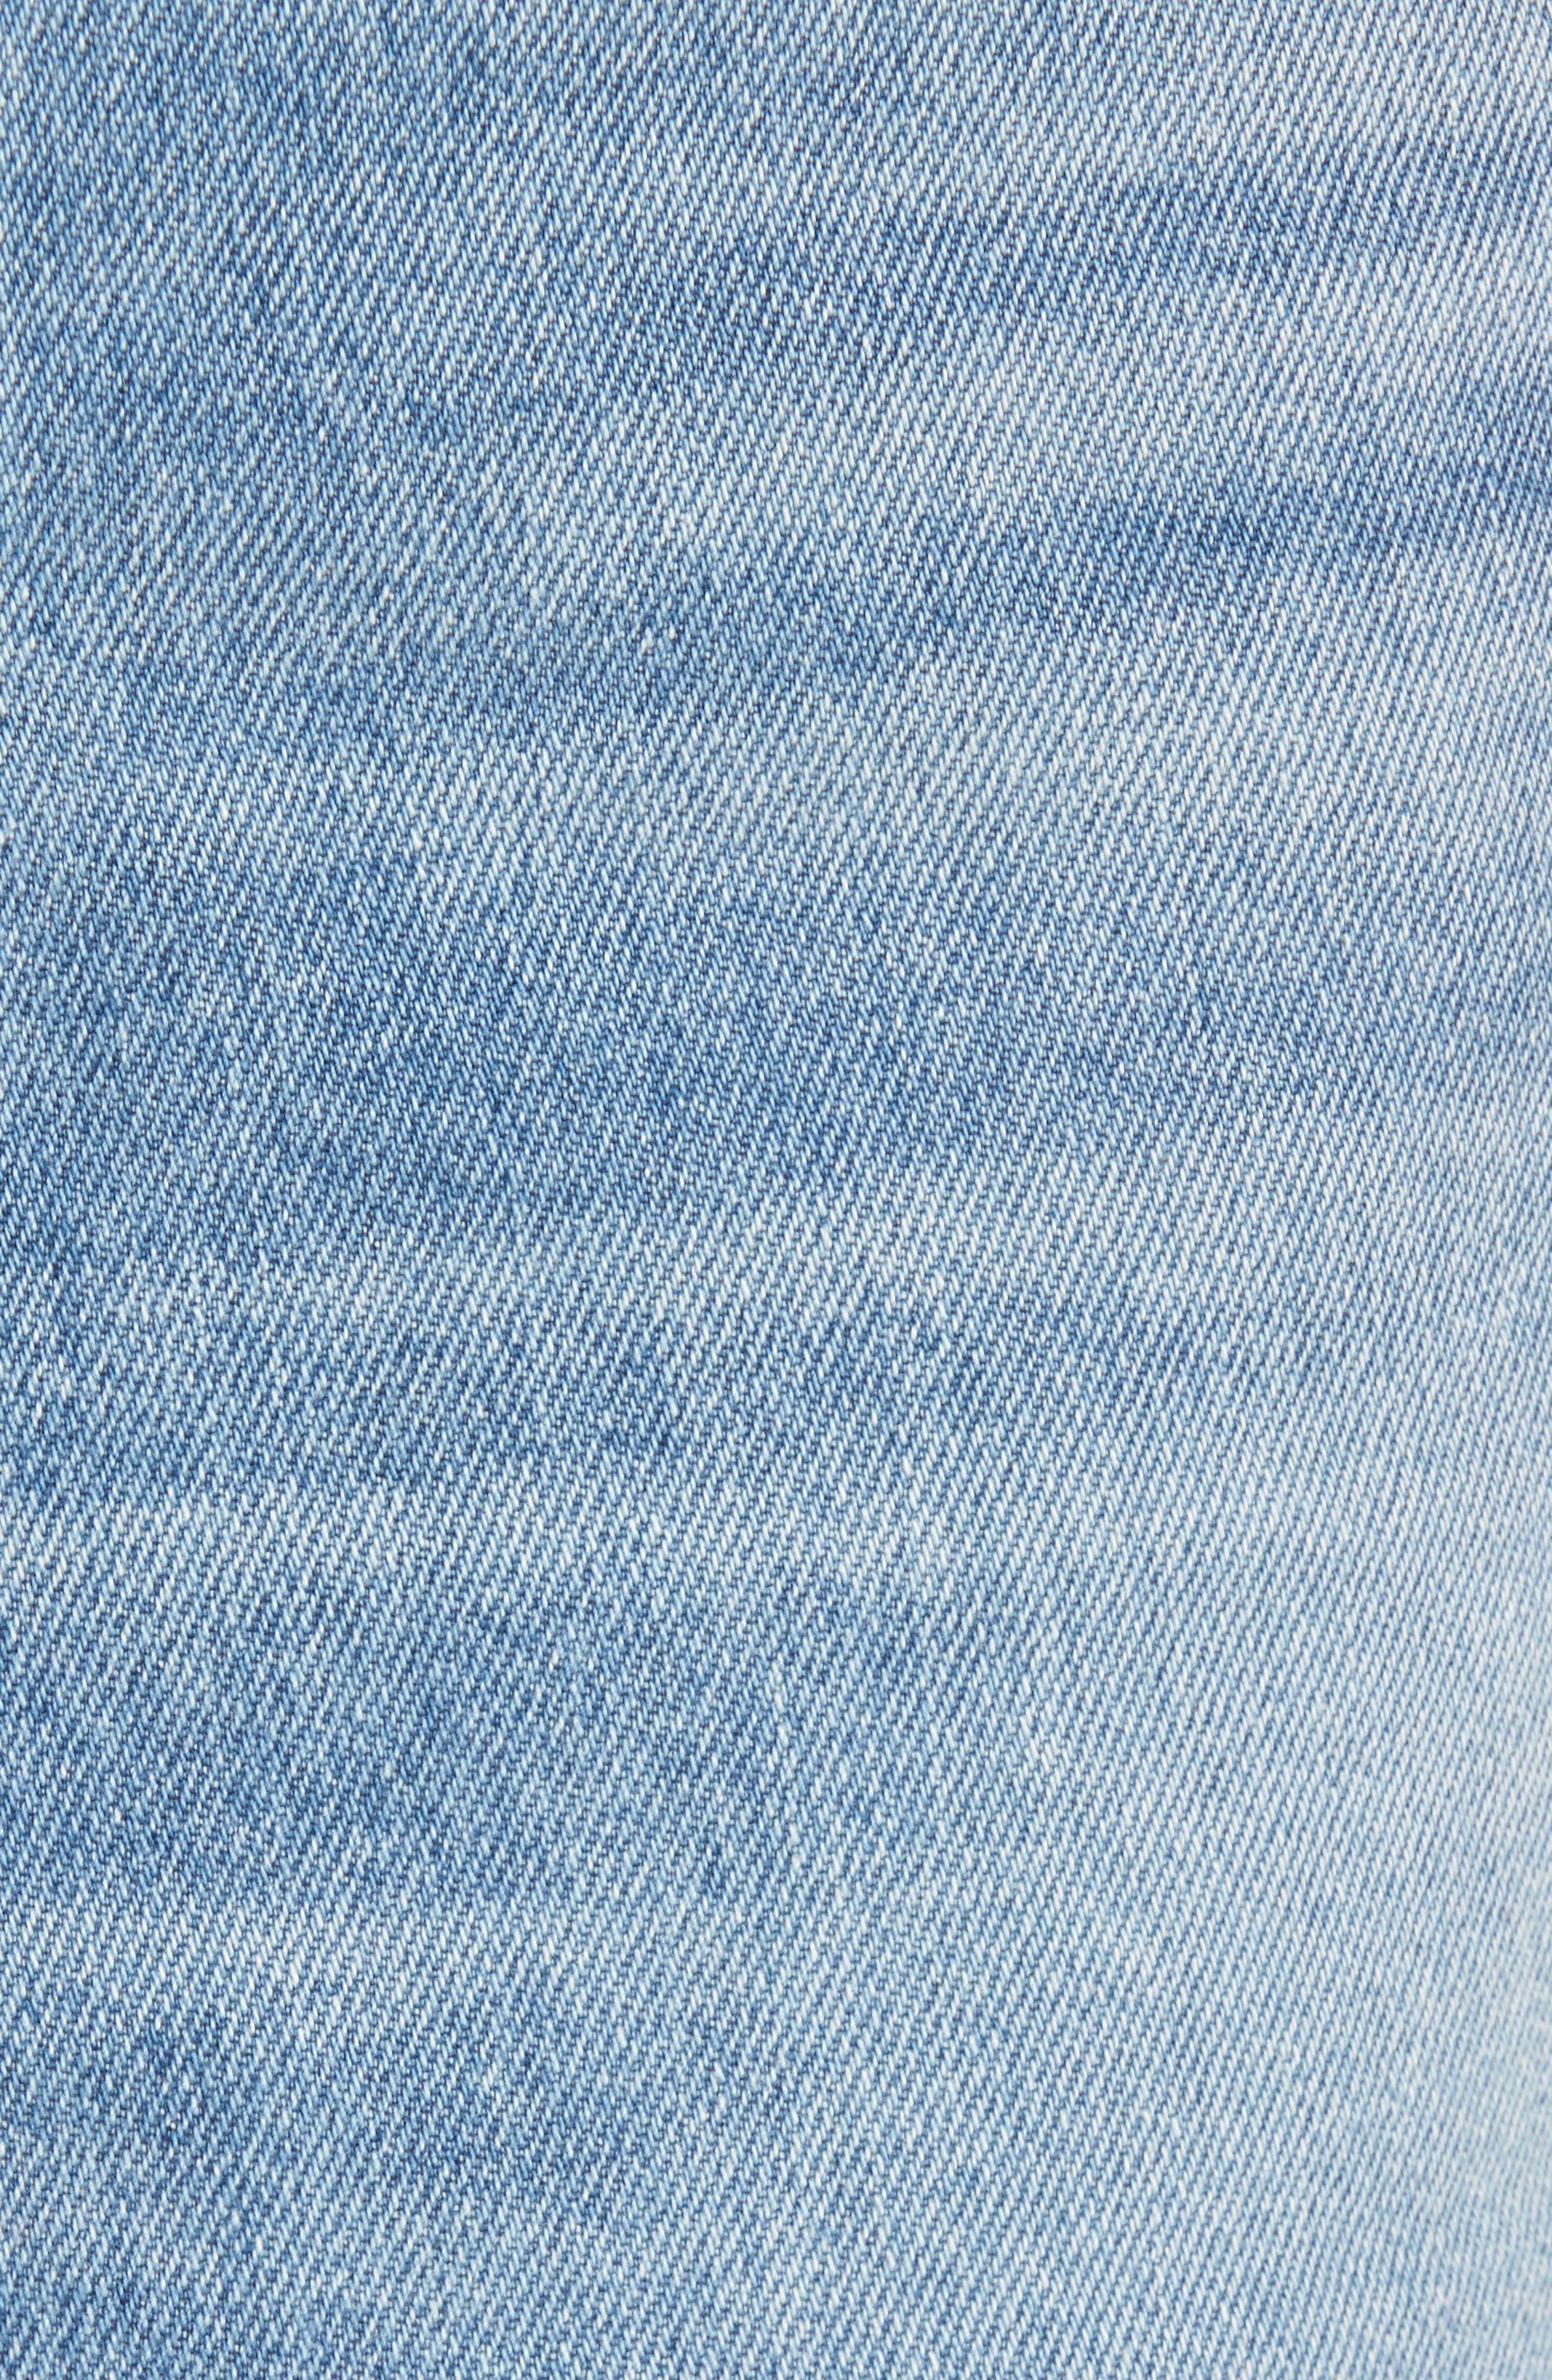 Quinn High Waist Denim Miniskirt,                             Alternate thumbnail 5, color,